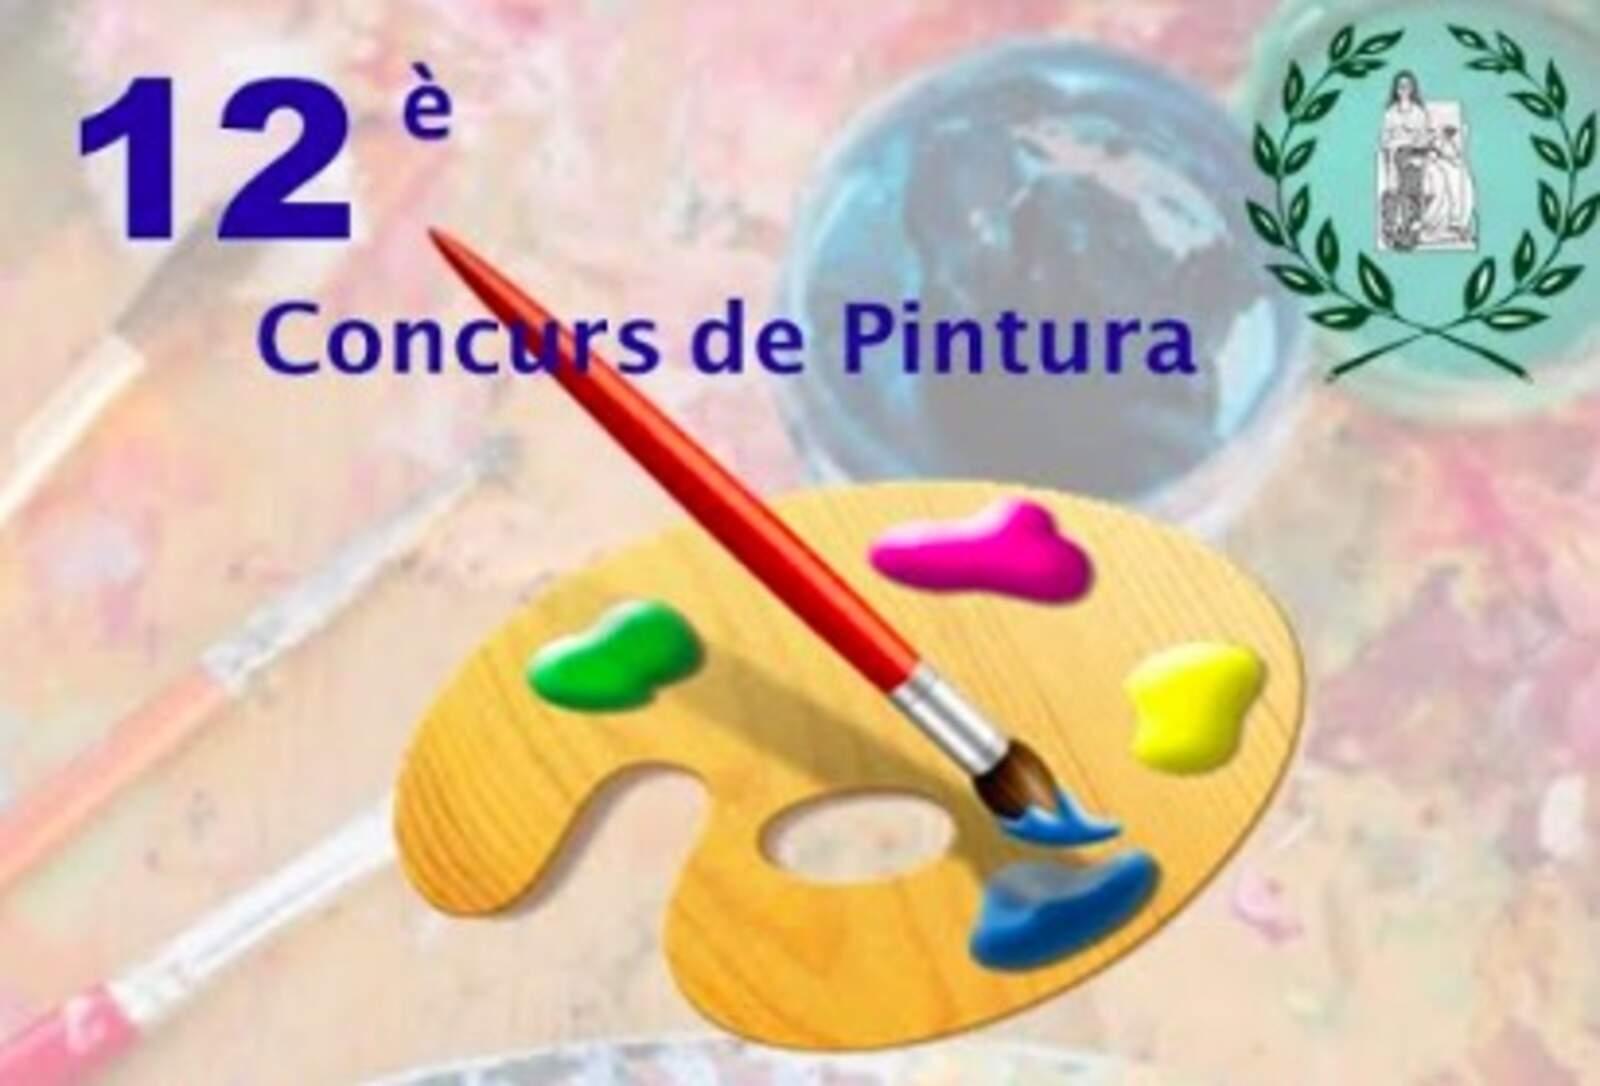 12è concurs de pintura